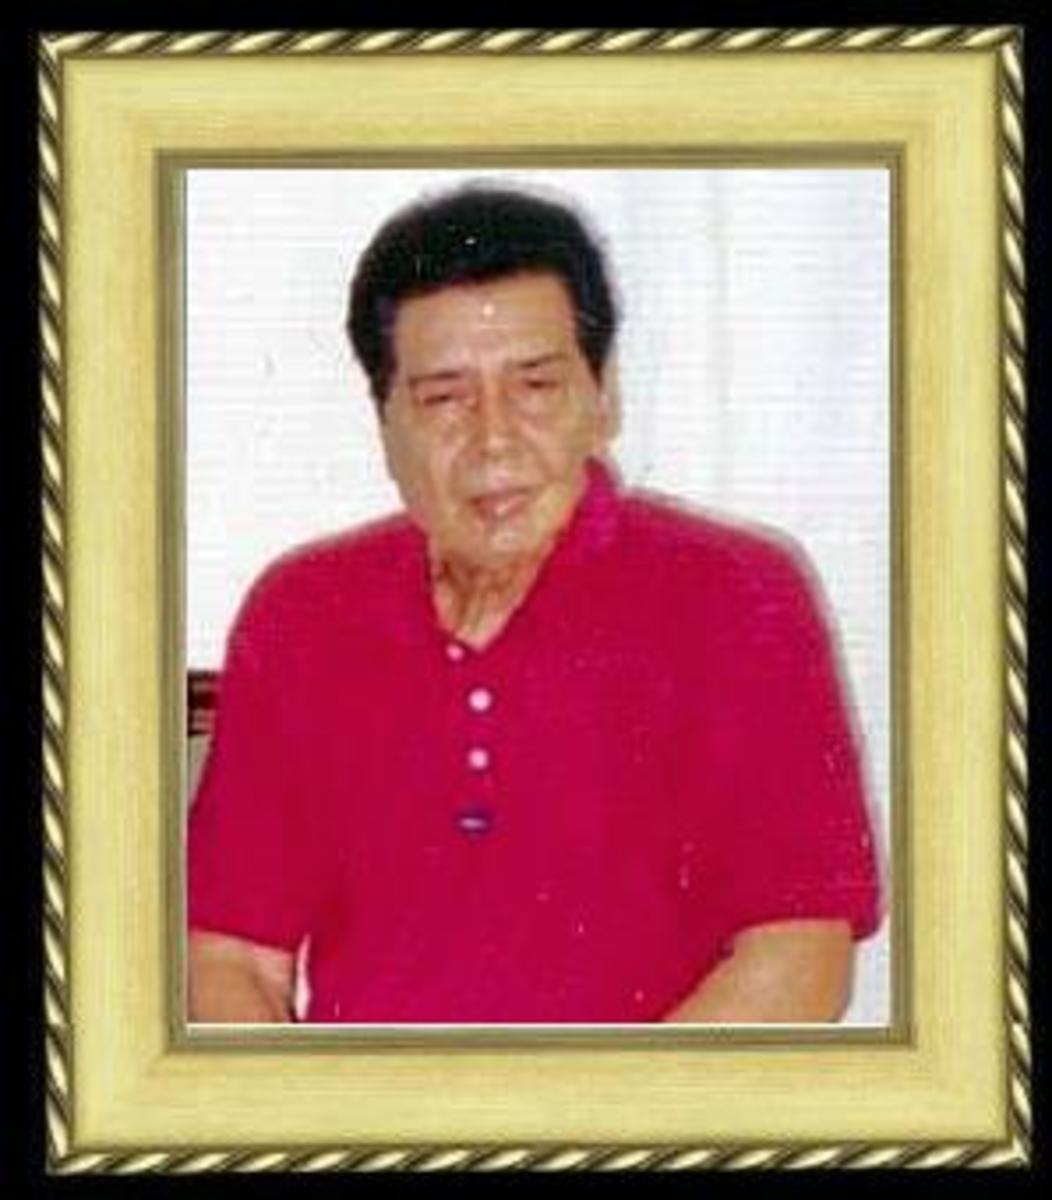 Sujit Kumar (died 5 February 2010, Mumbai) - cancer deaths